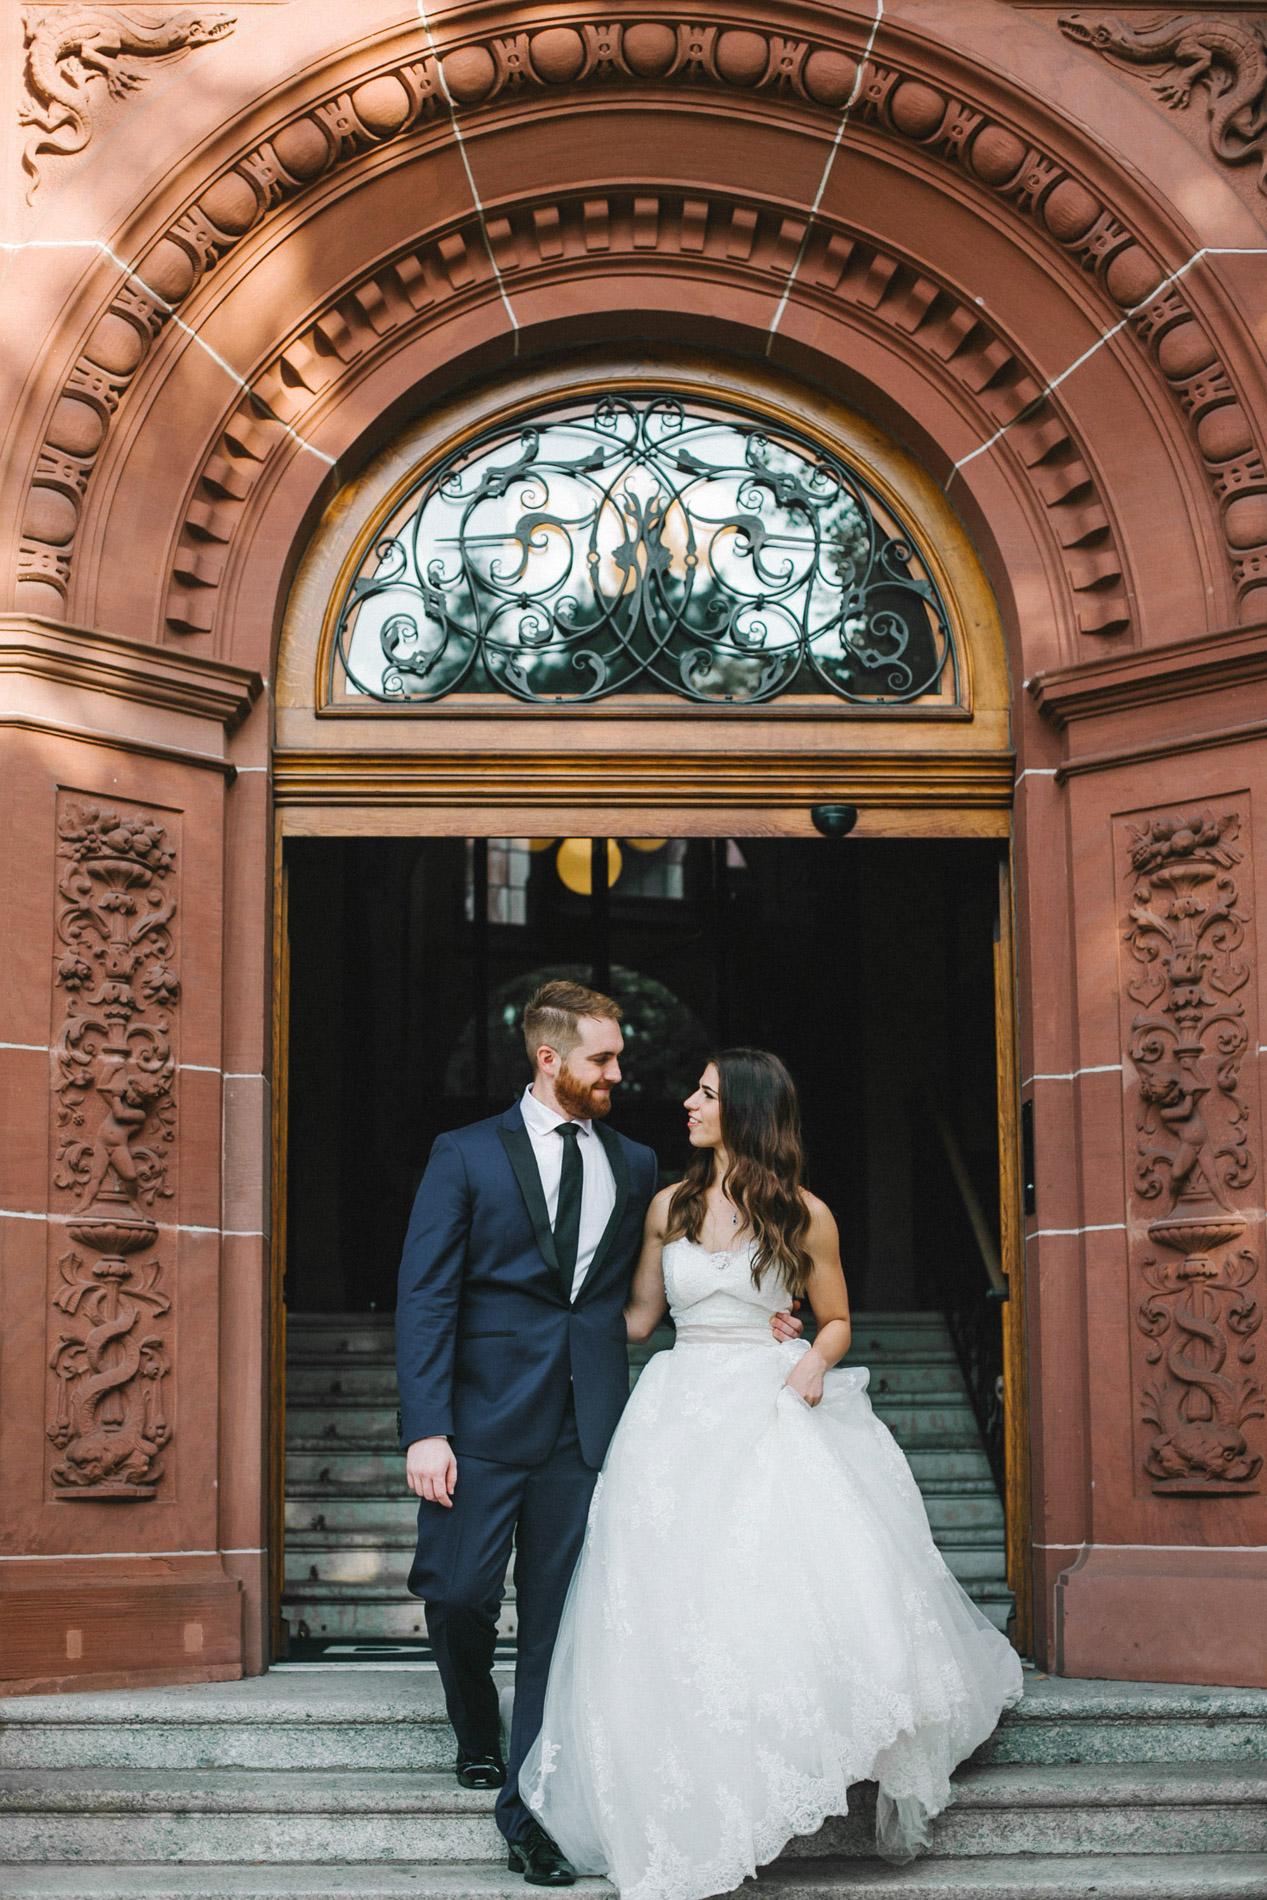 hochzeitsfotografie-schweiz_wedding-photographer-switzerland-europe_Bendik-Photography-110